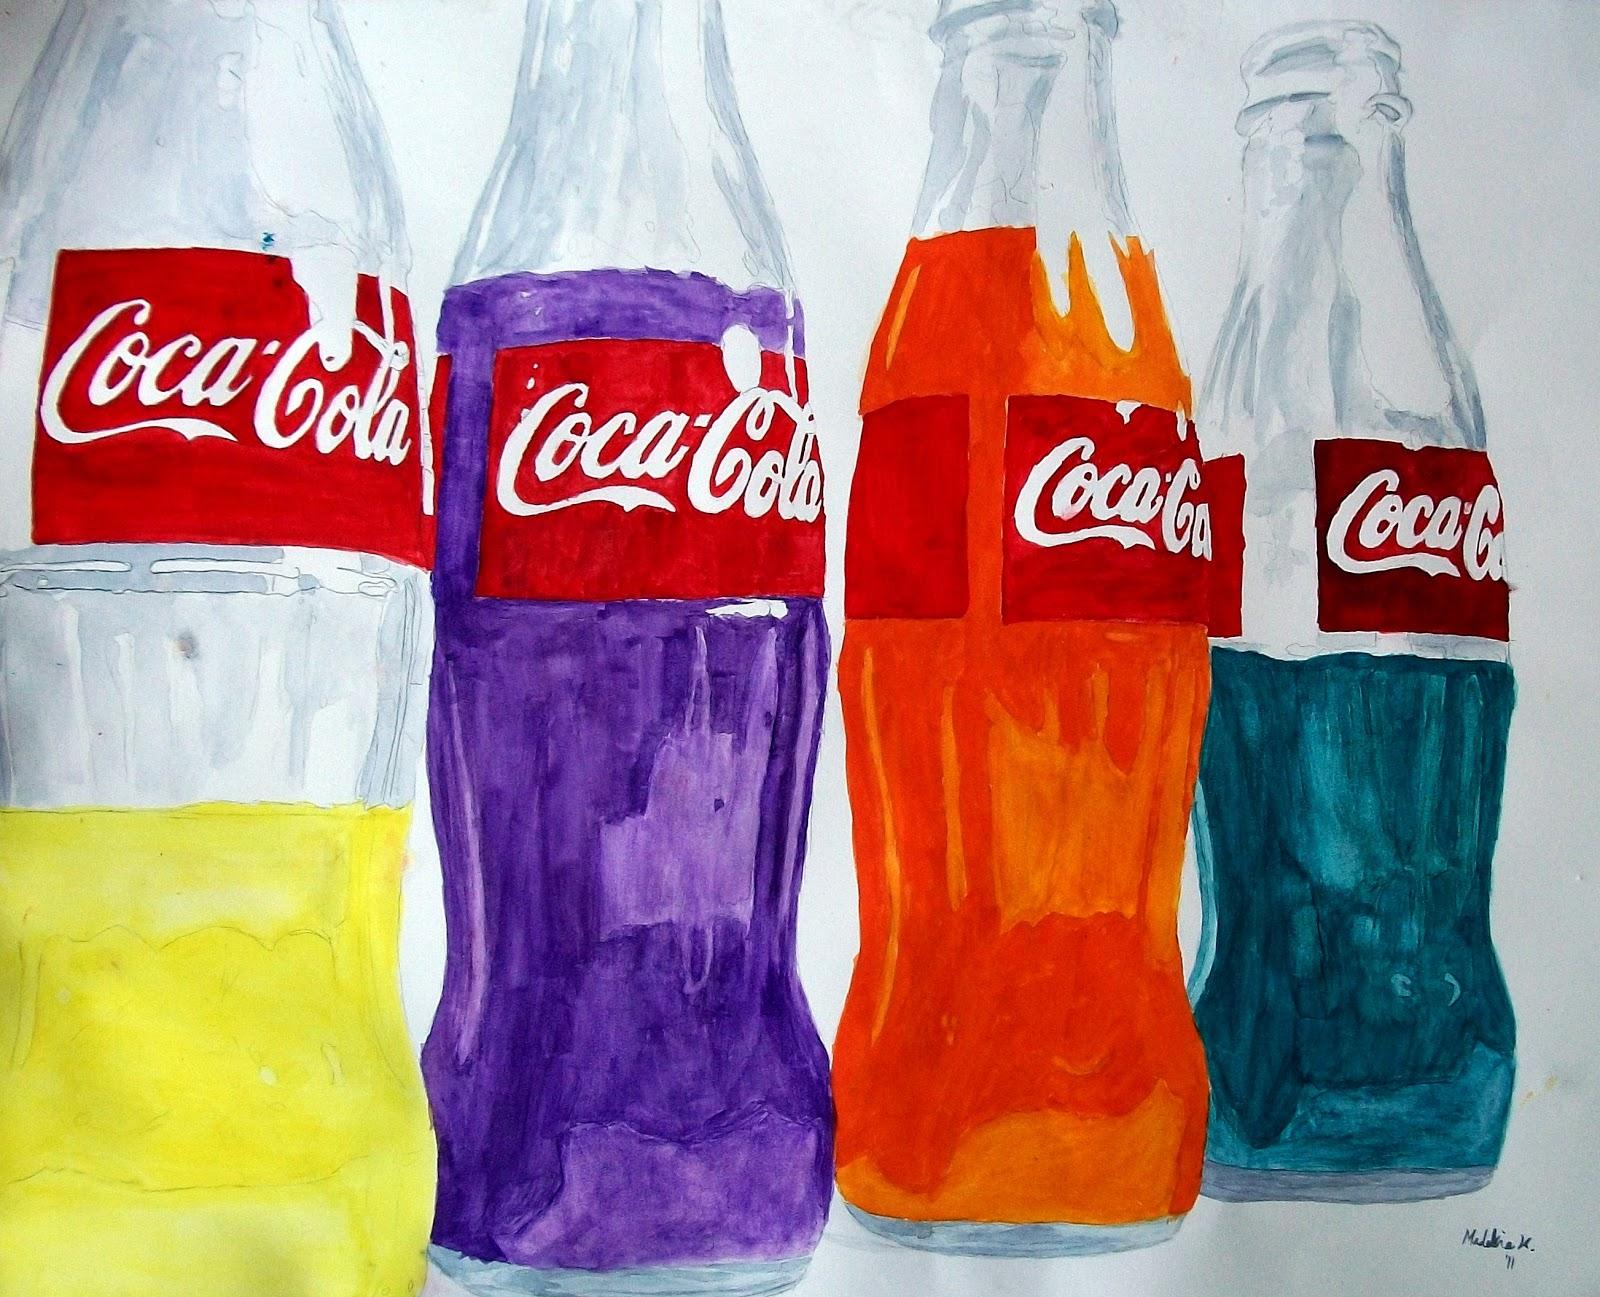 artistic explorations may 2011